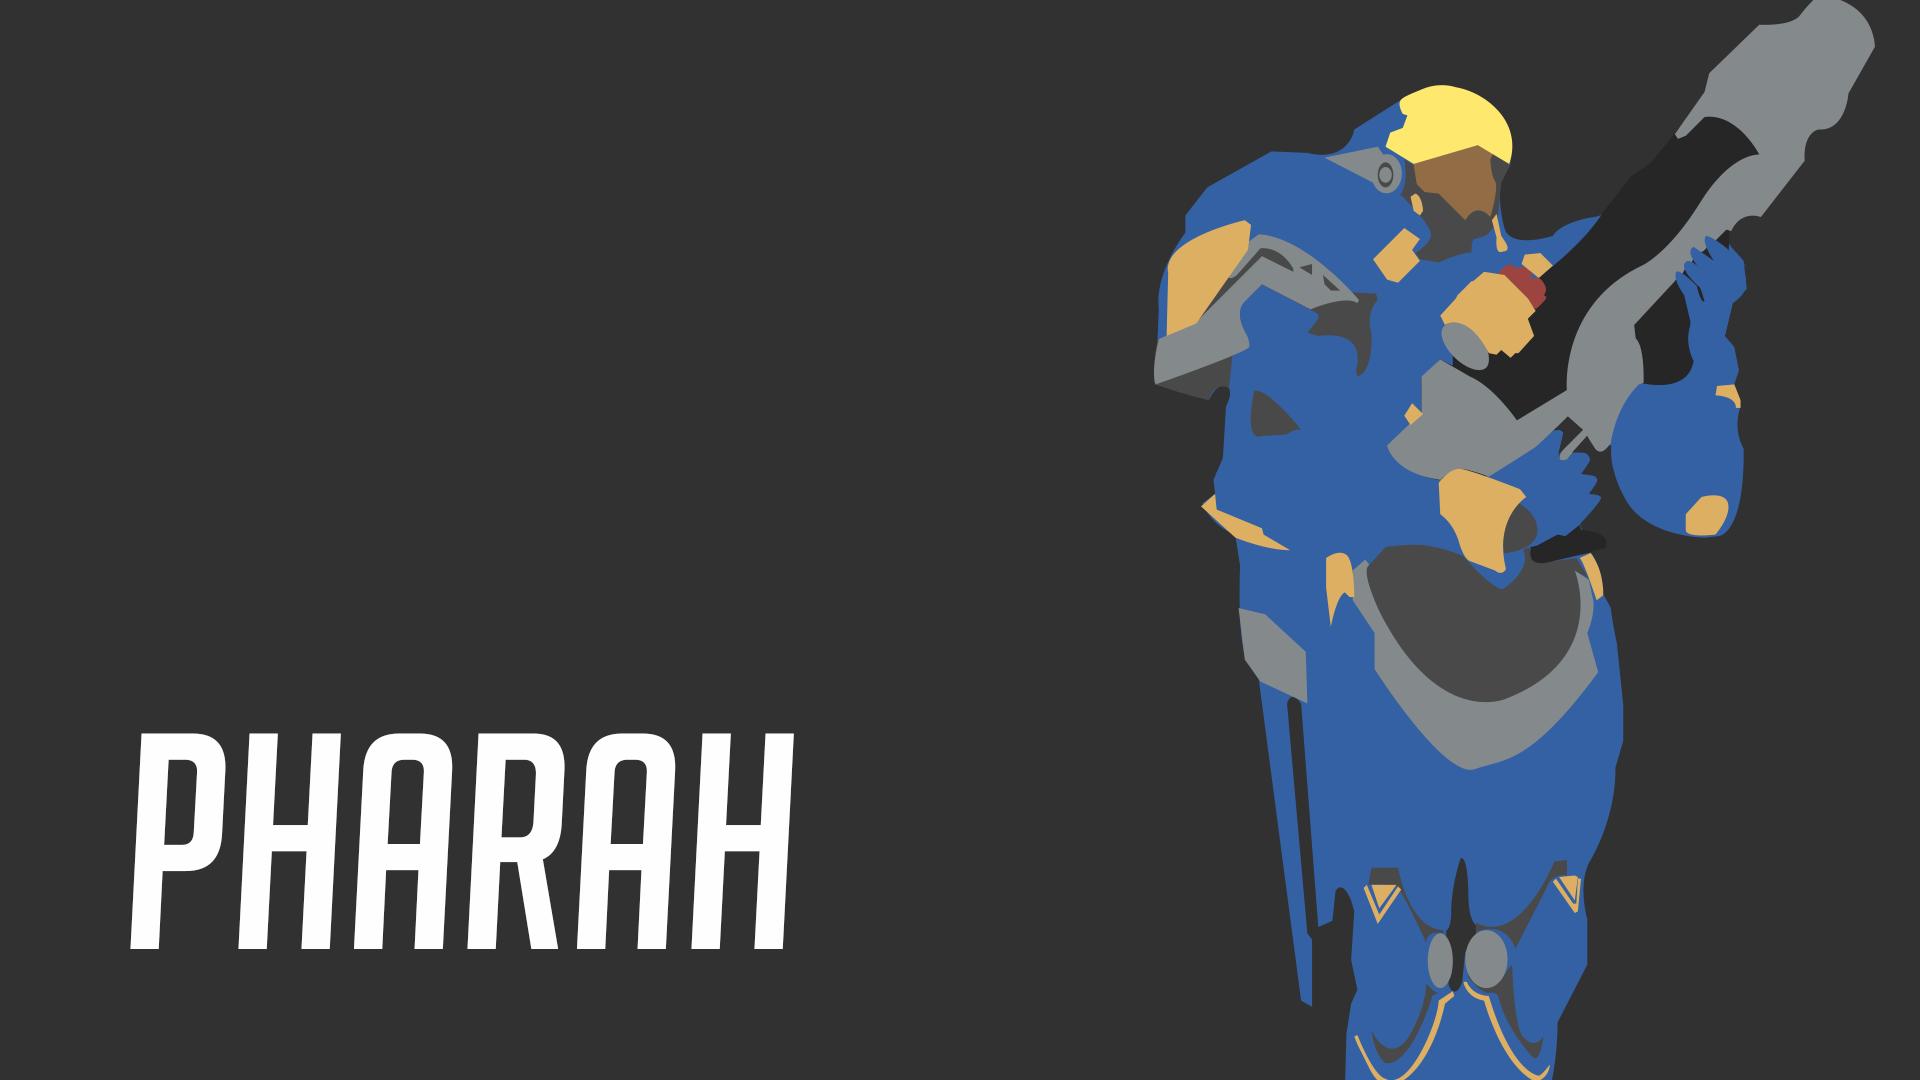 Hintergrundbilder Pharah Overwatch Vektor Vektorgrafiken